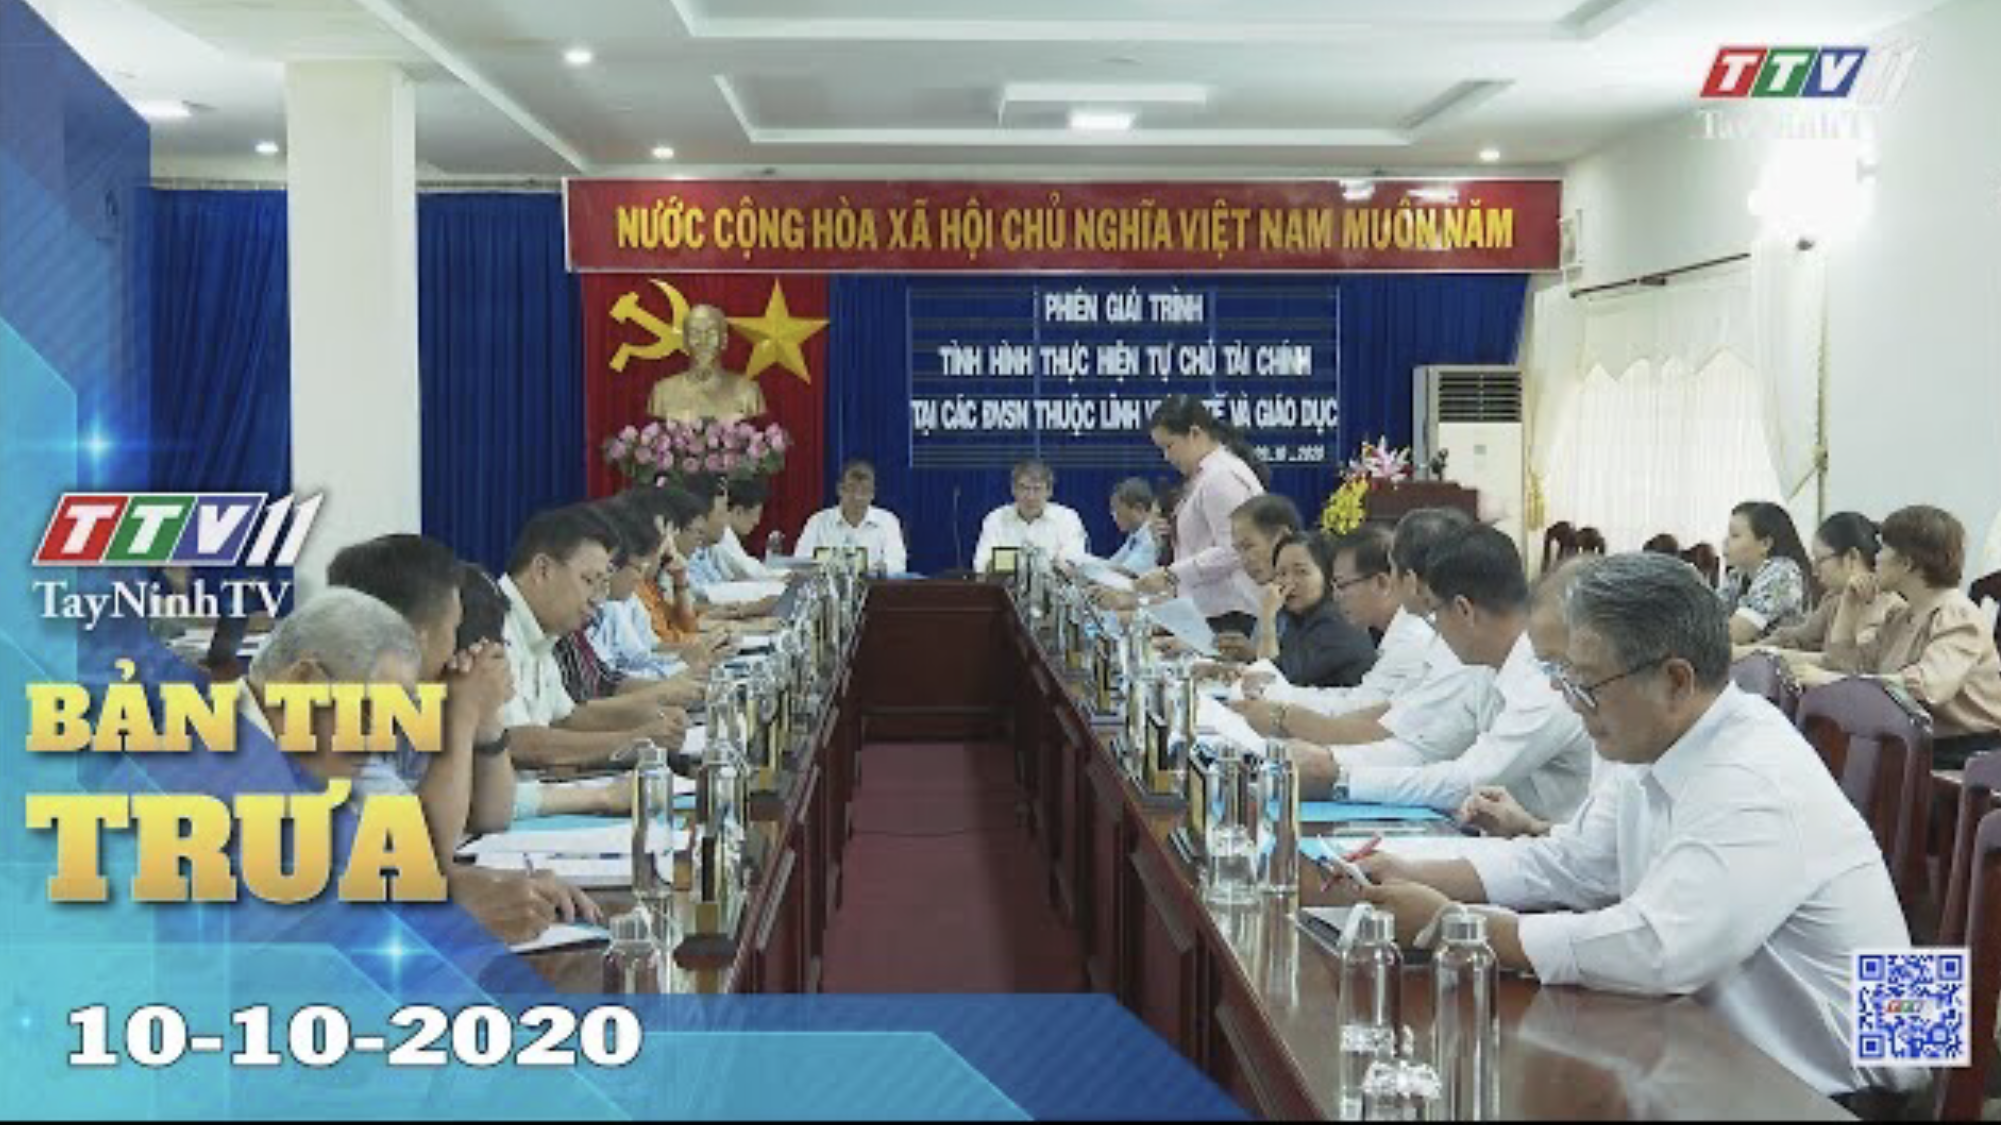 Bản tin trưa 10-10-2020 | Tin tức hôm nay | TayNinhTV